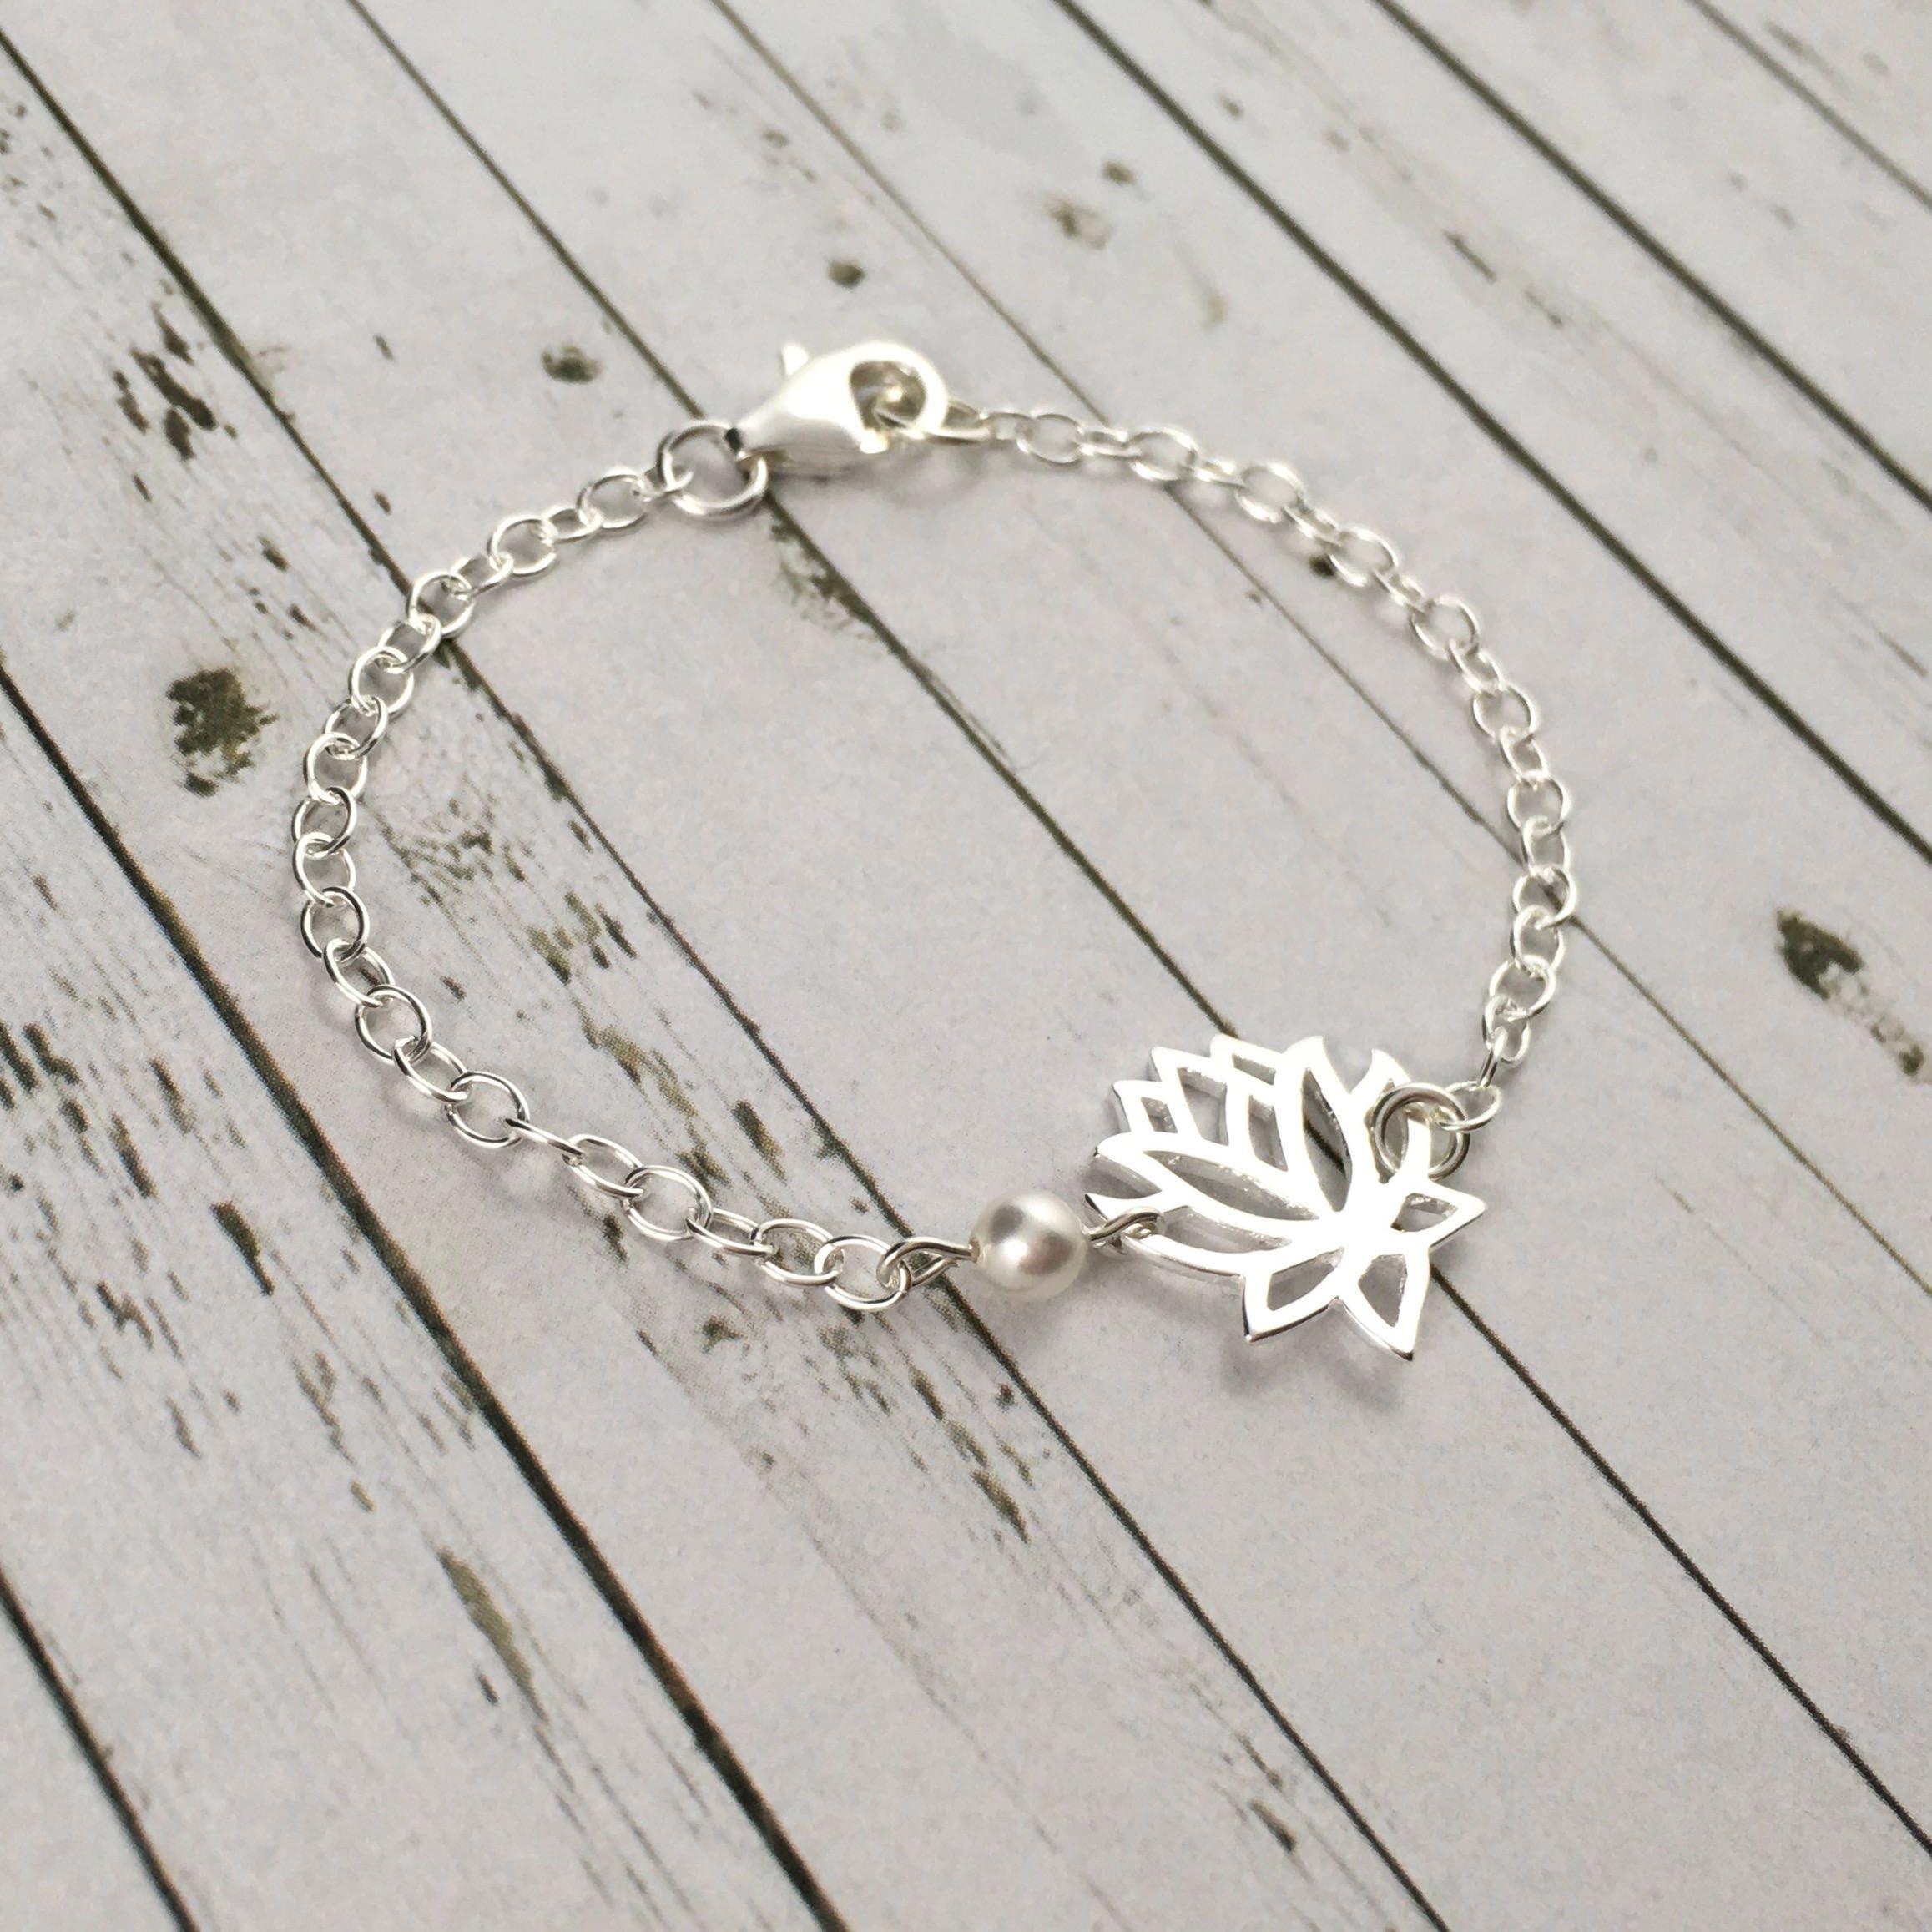 Lotus bracelet lotus flower jewelry sterling silver dainty bracelet lotus bracelet lotus flower jewelry sterling silver dainty bracelet lotus flower bracelet izmirmasajfo Images